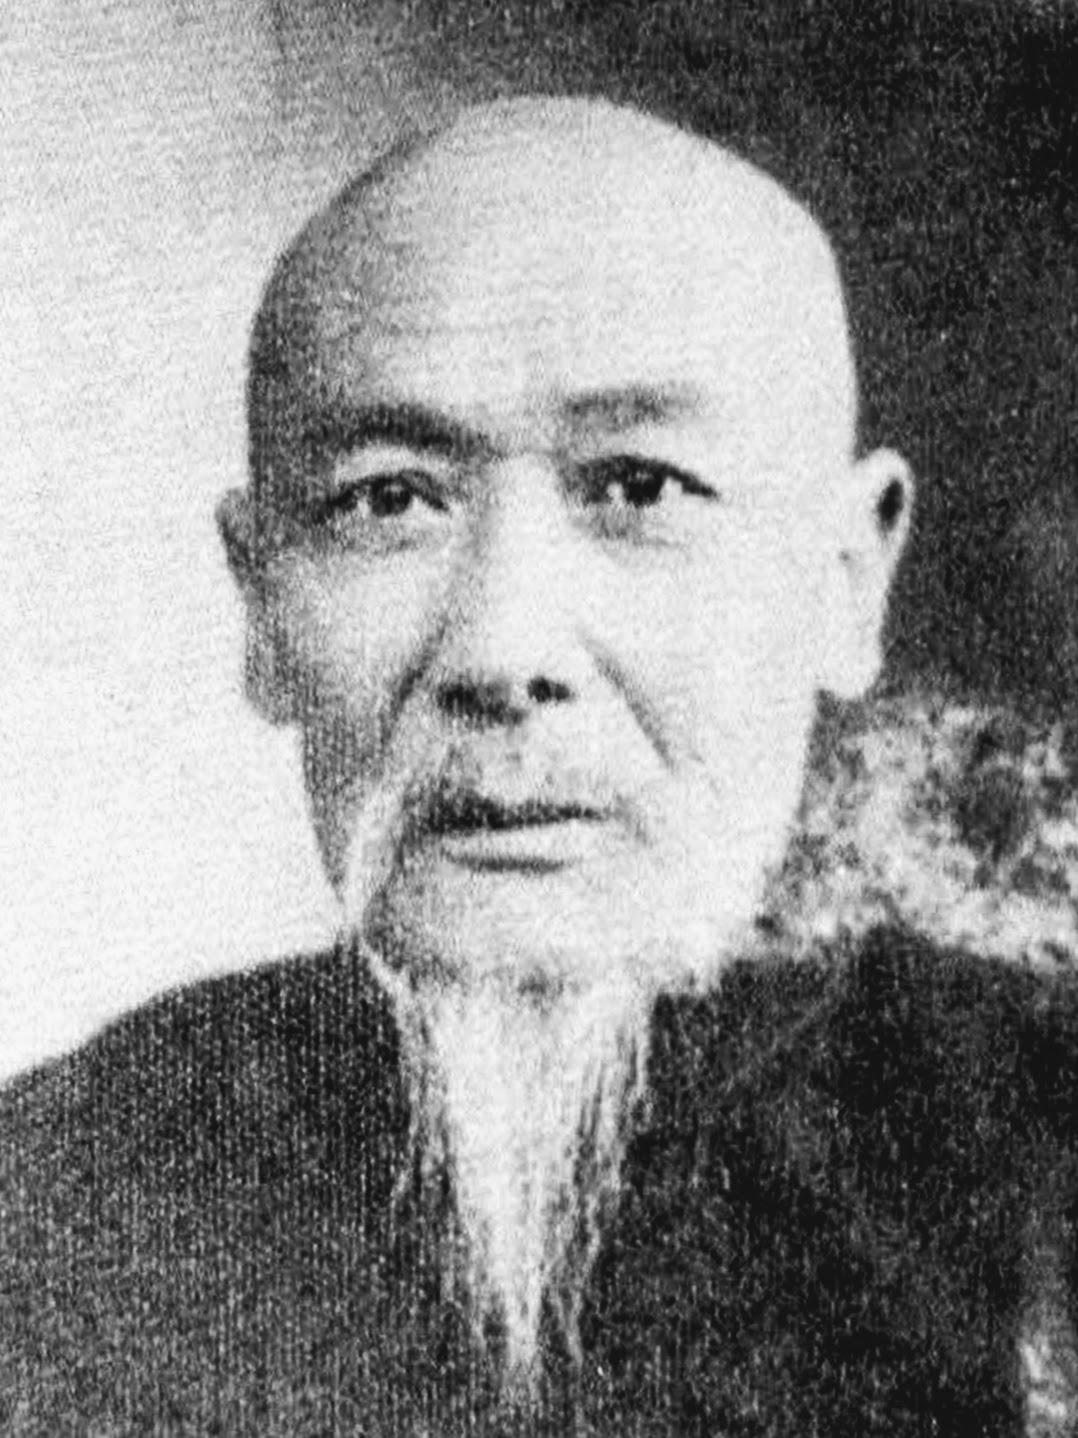 Portrait de Yang Shaohou